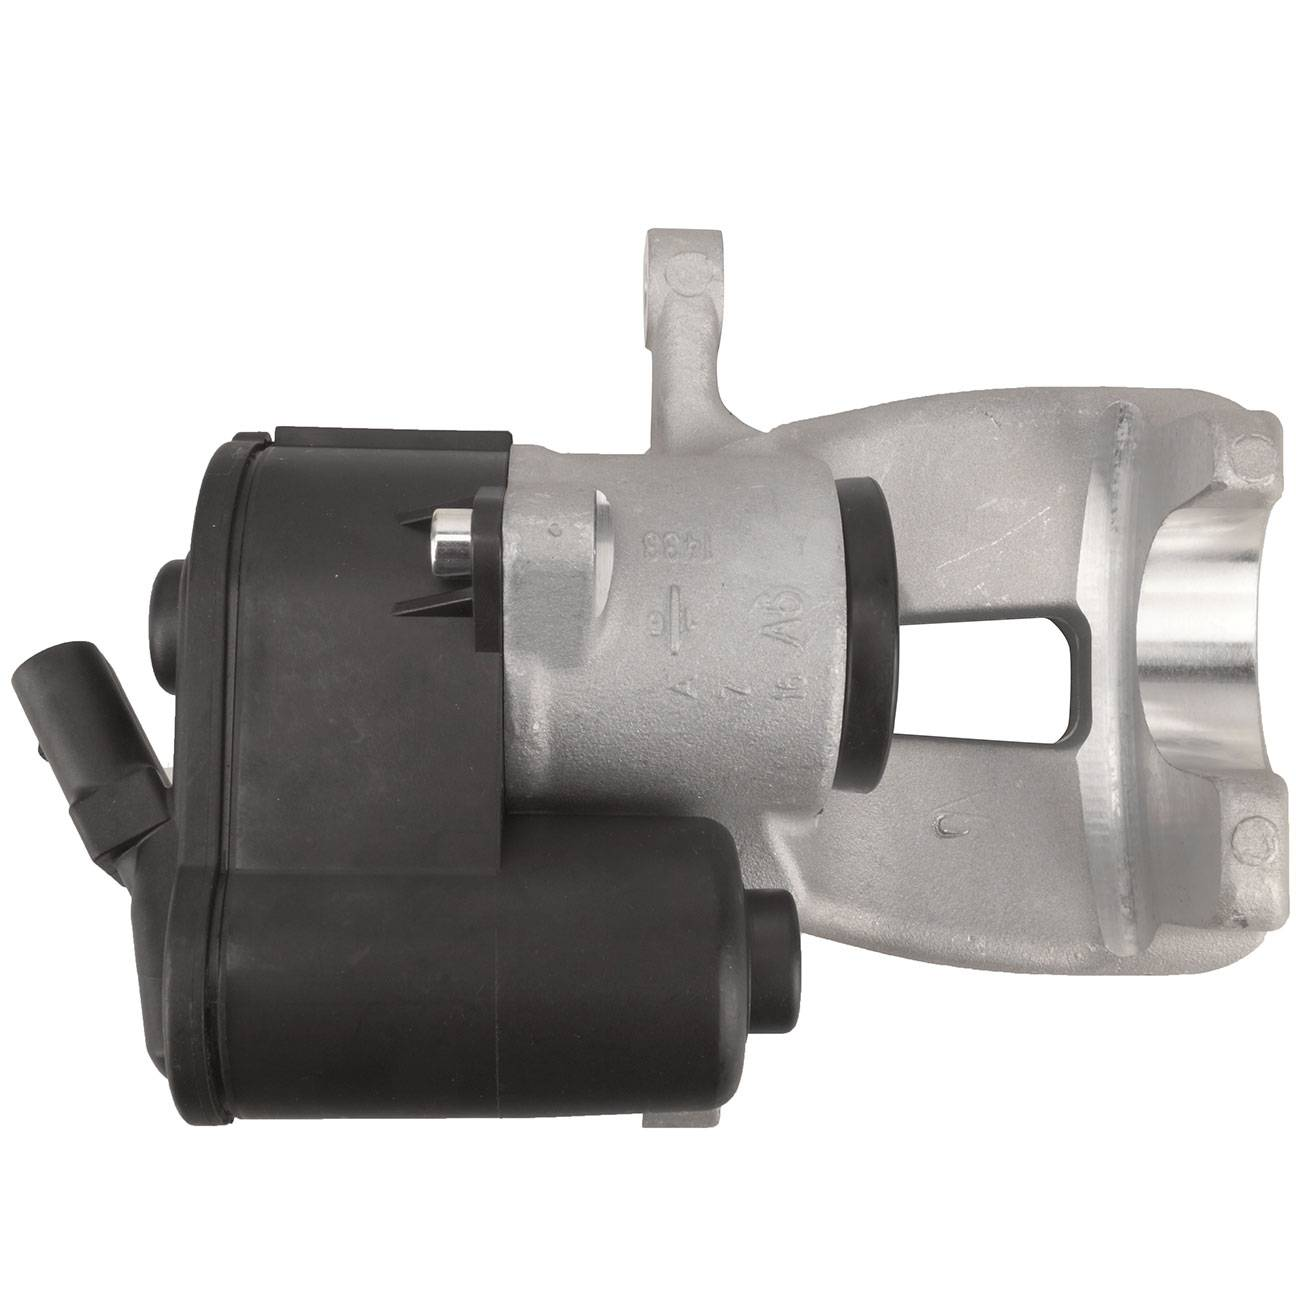 Bapmic-Rear-Left-Brake-Caliper-Brake-System-for-BMW-220i-228i-235i-320i-328i thumbnail 2